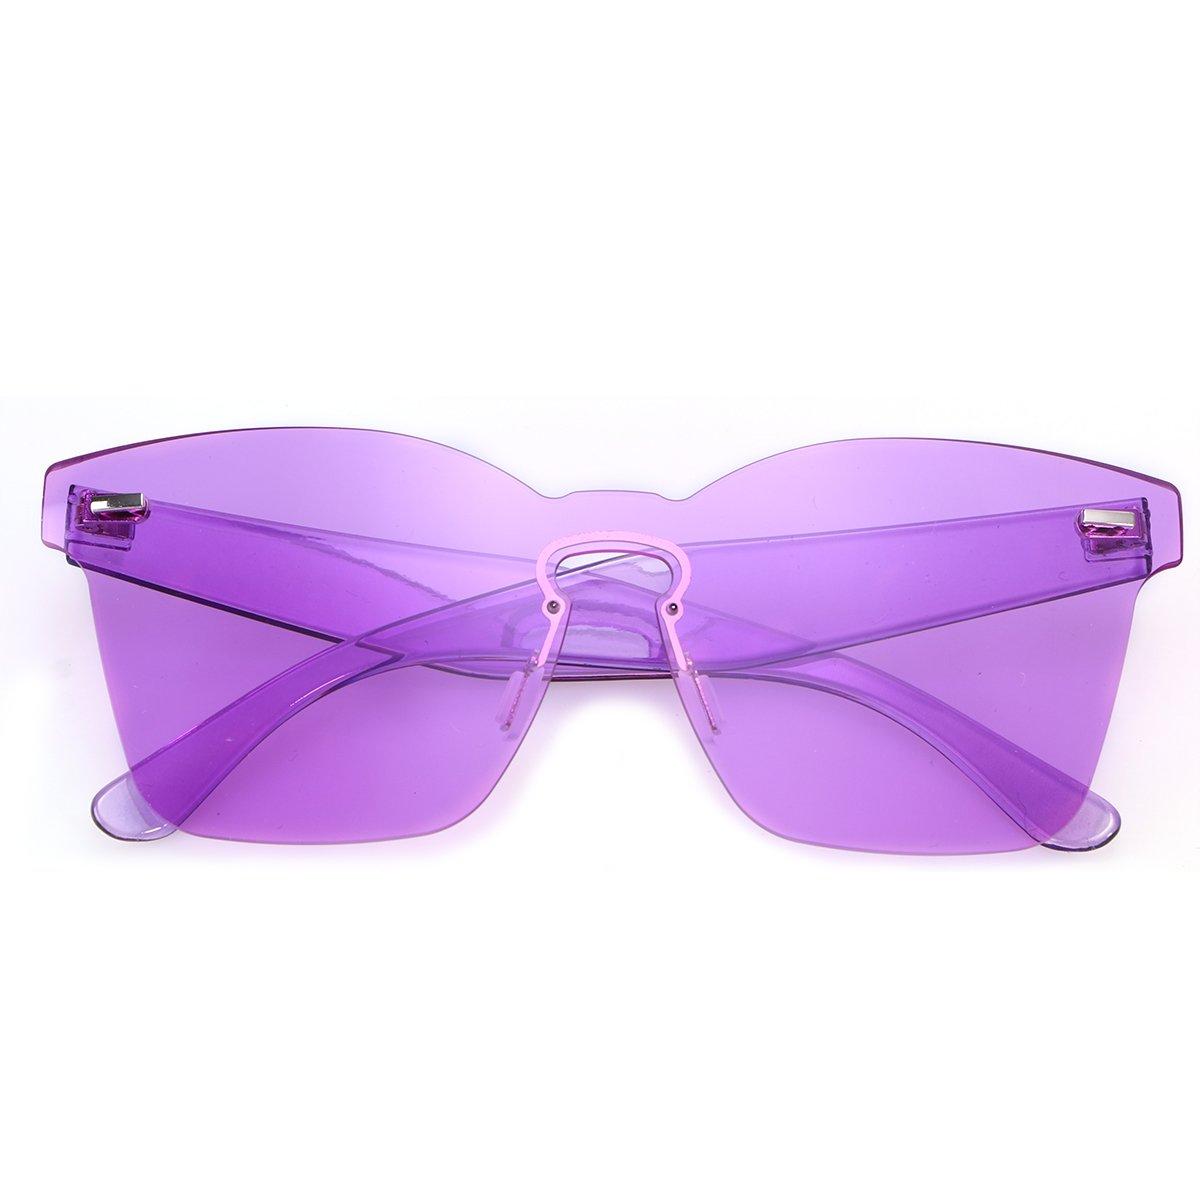 487274ec87ea OULII Rimless Sunglasses Novelty Pratical Beach Seaside Sunglass Mirror  Summer Eyewear for Men Women (Purple) at Amazon Women's Clothing store: